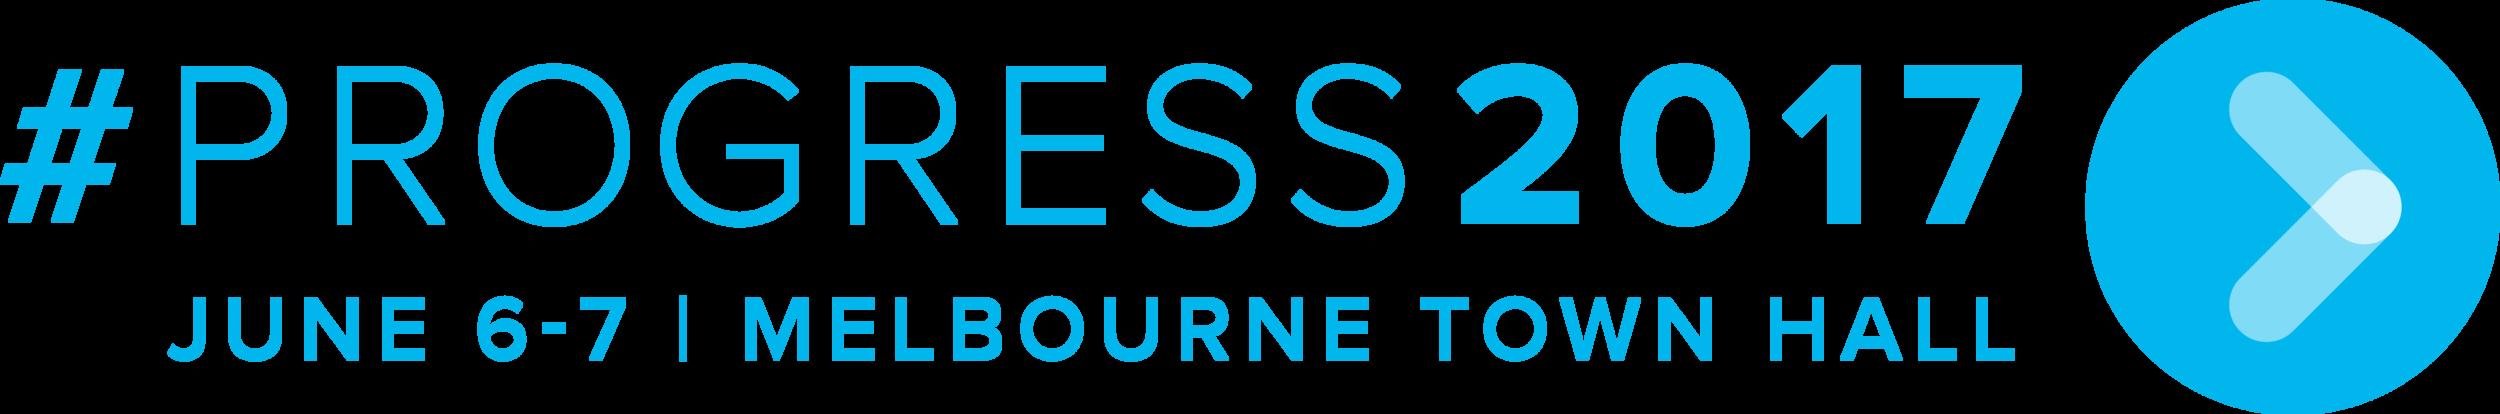 Progress 2017 Logo